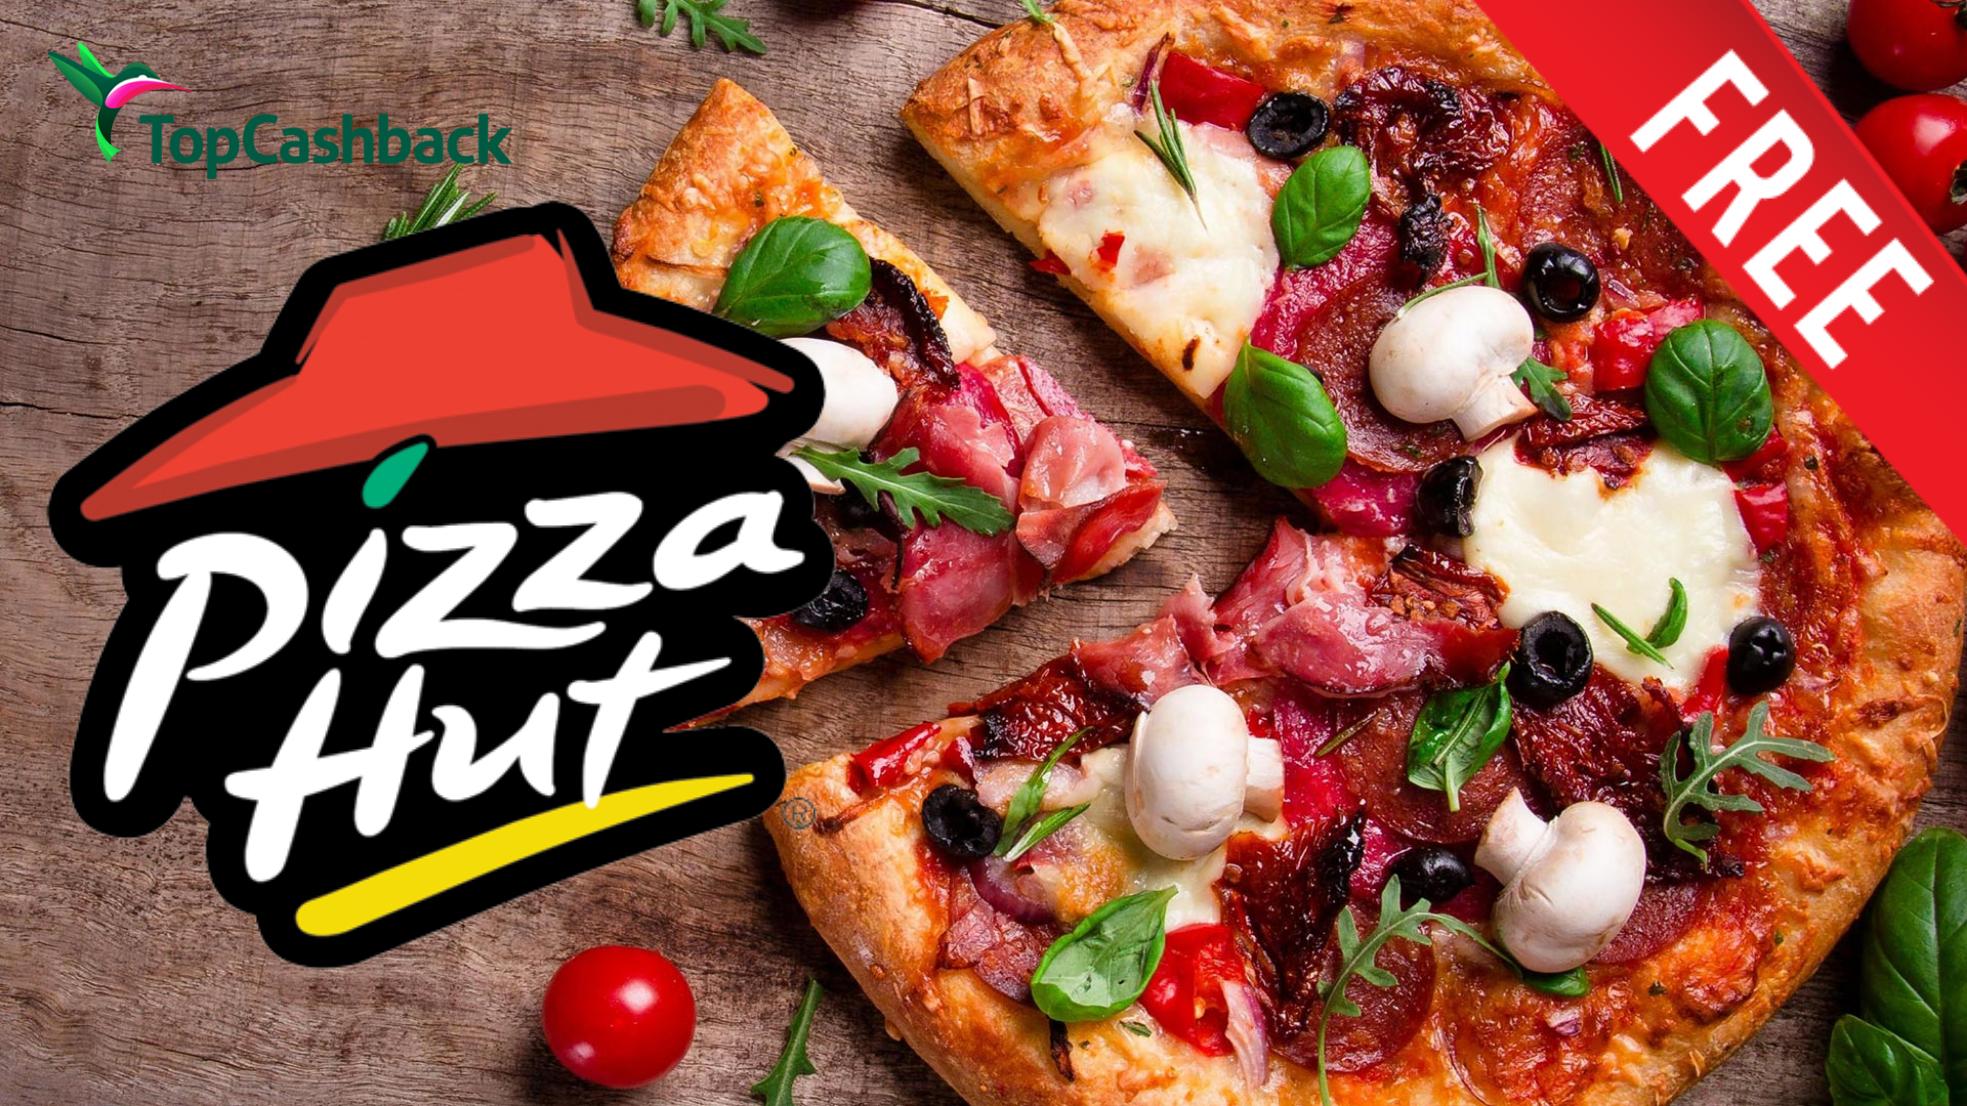 FREE PIZZAHUT TAKEAWAY (UPTO £15) via TCB